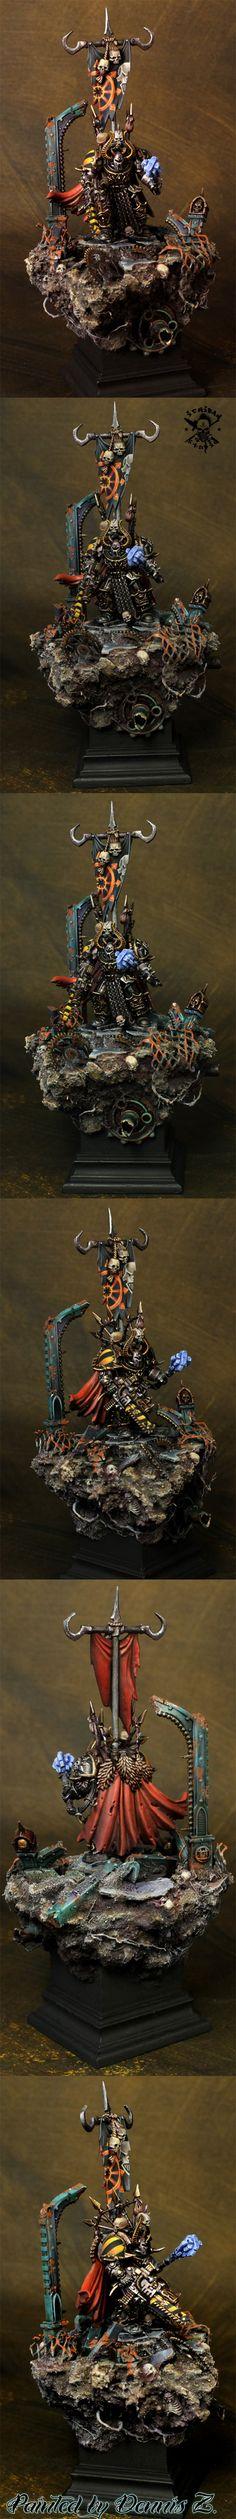 Iron Warriors Chaos Terminator conversion